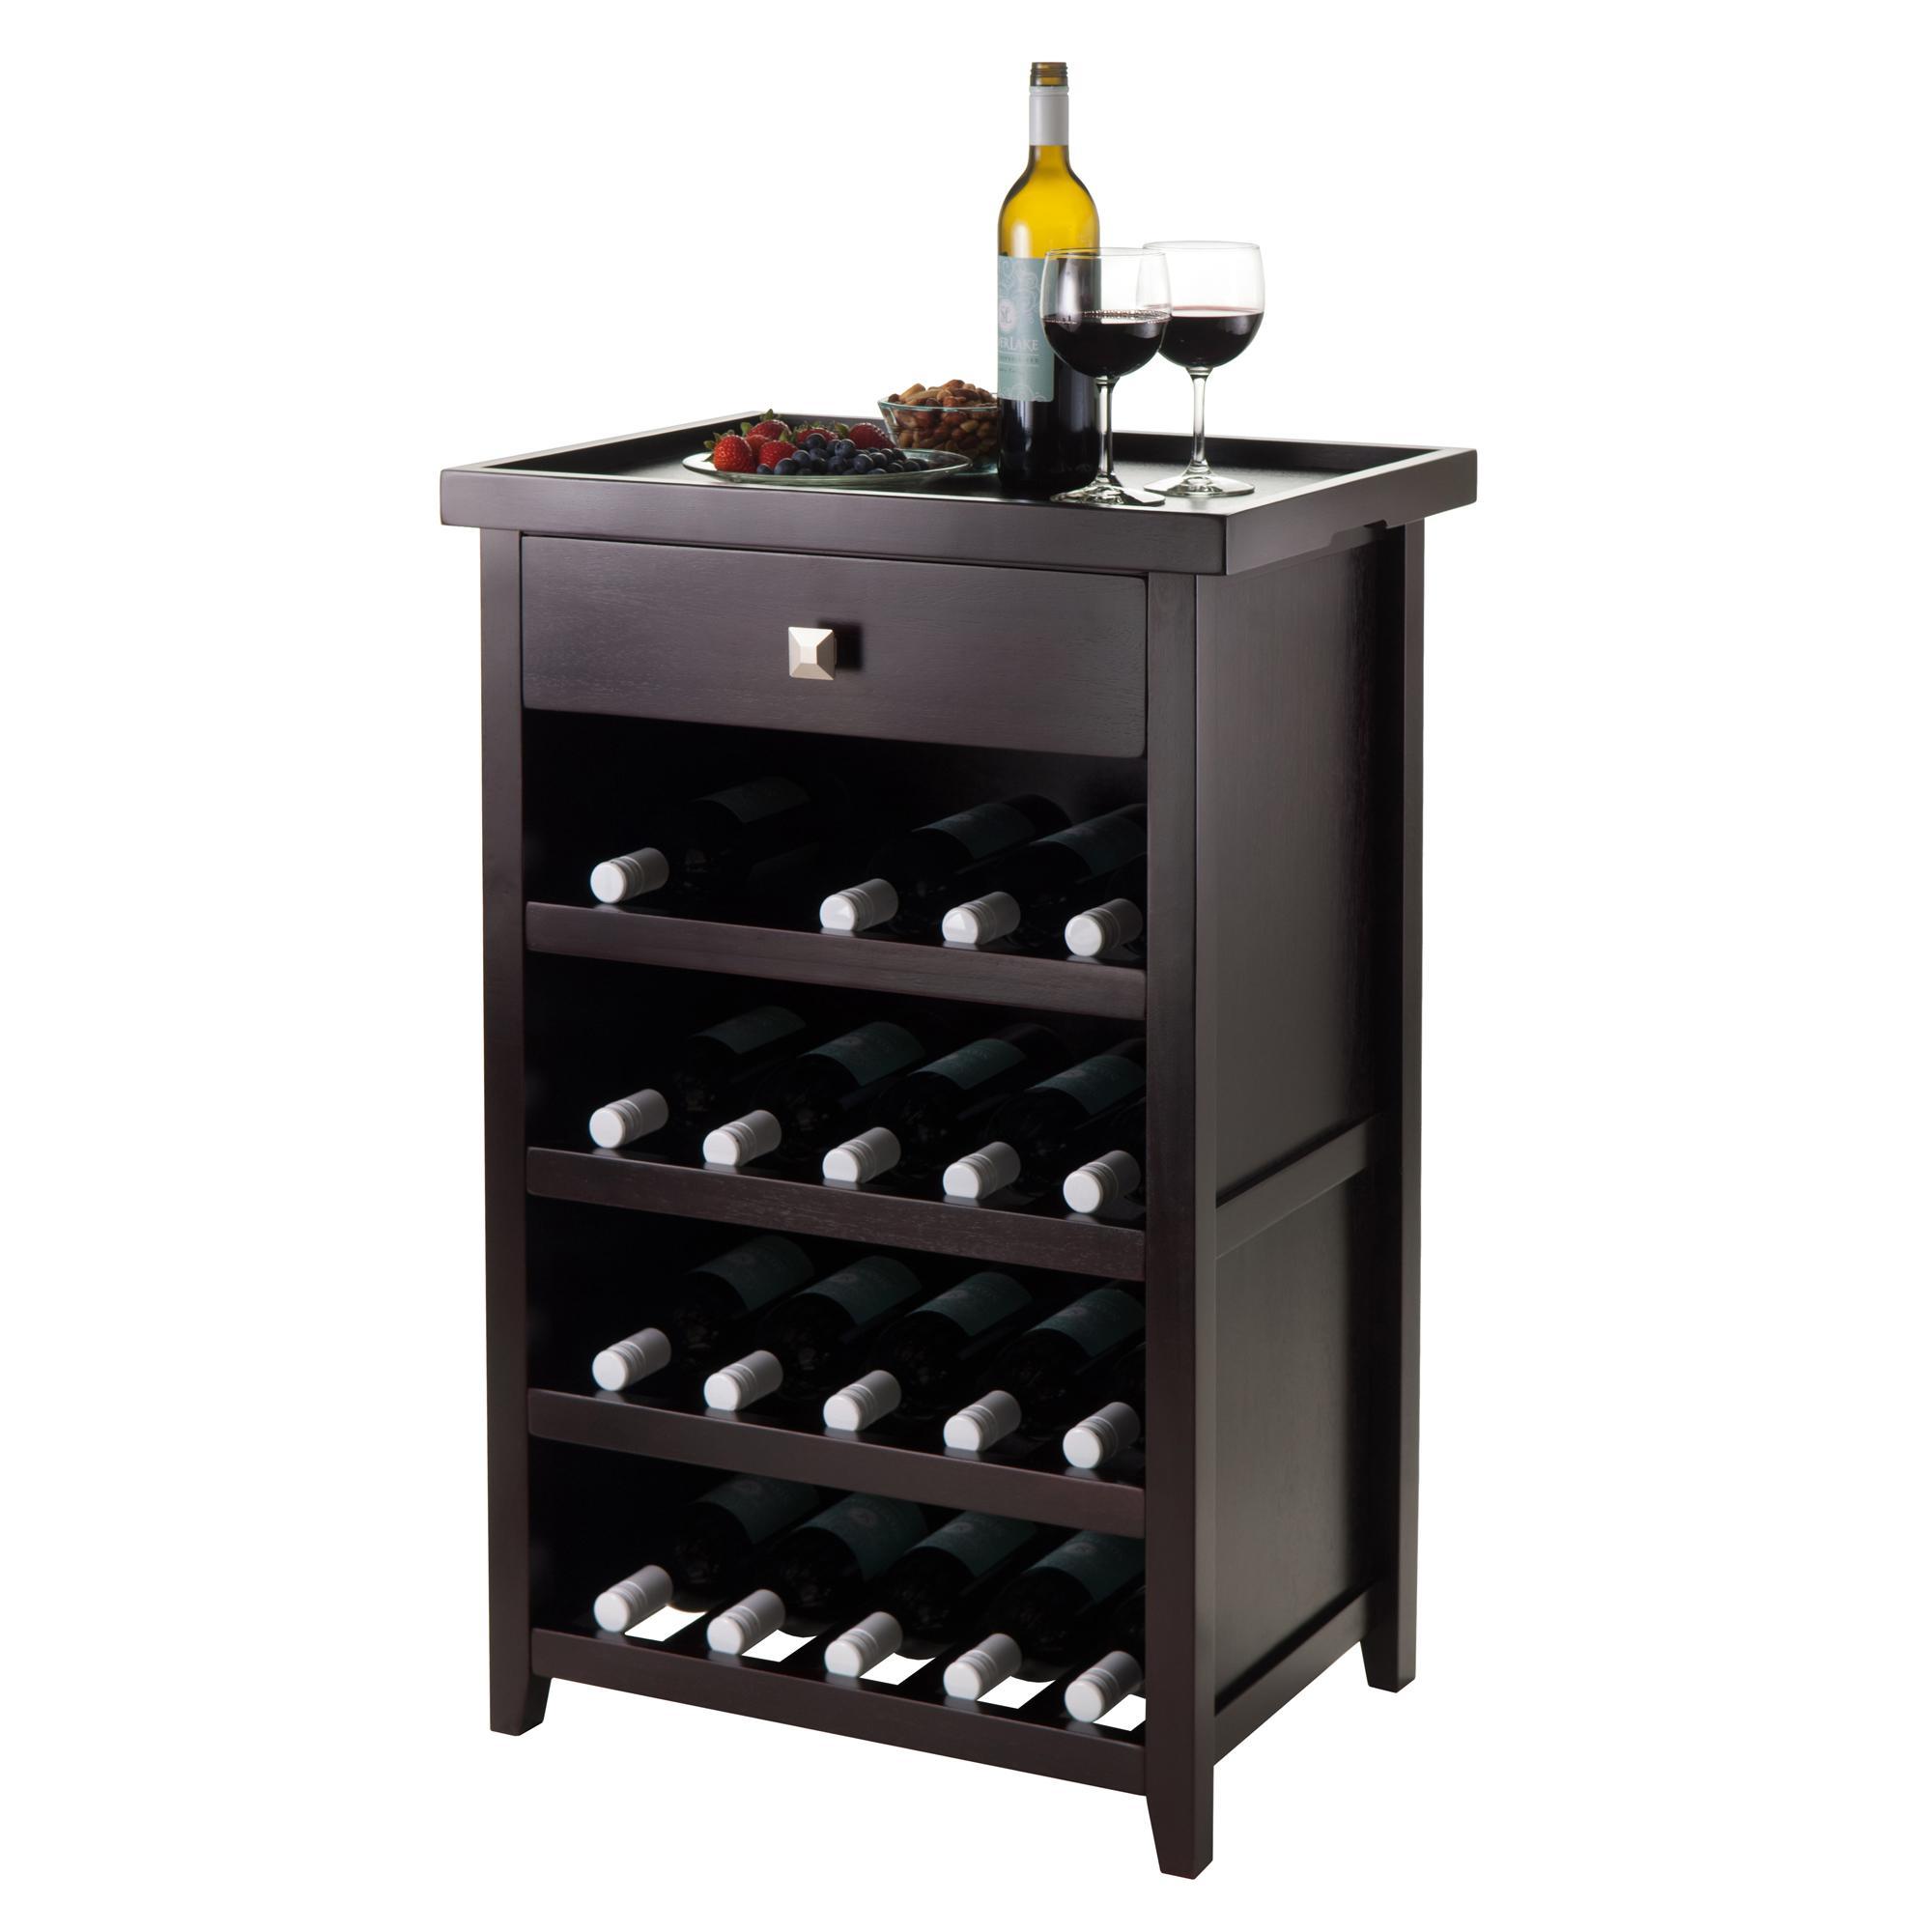 Wine Racks Kitchen Cabinets: Amazon.com: Winsome Wood Zillah Wine Cabinet With